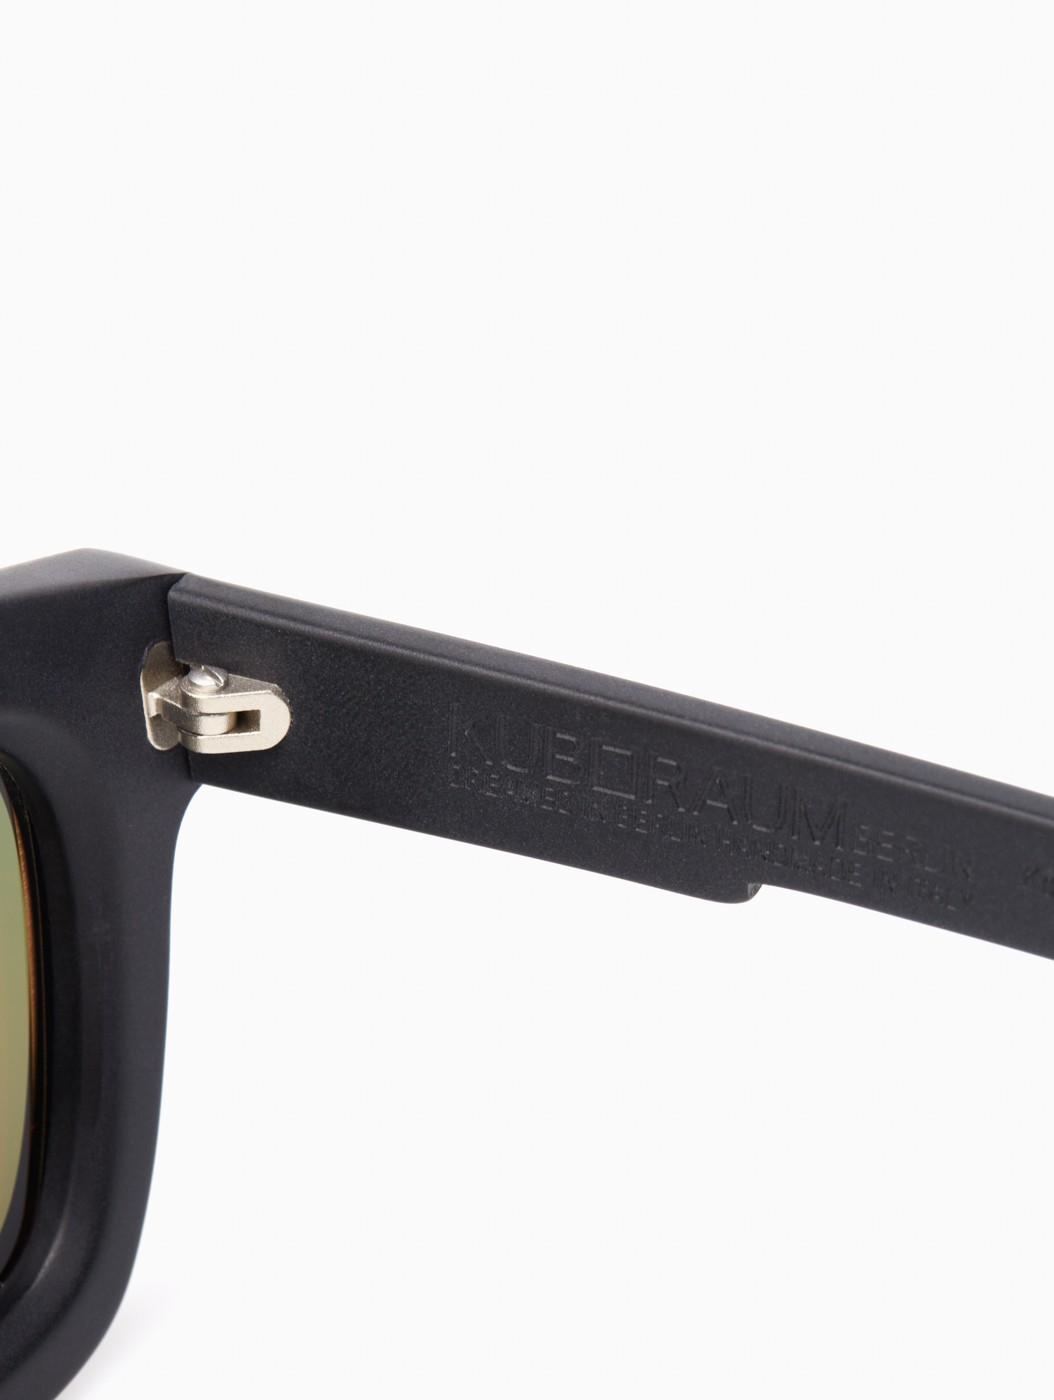 Kuboraum C2 Bm Sunglasses in Black for Men